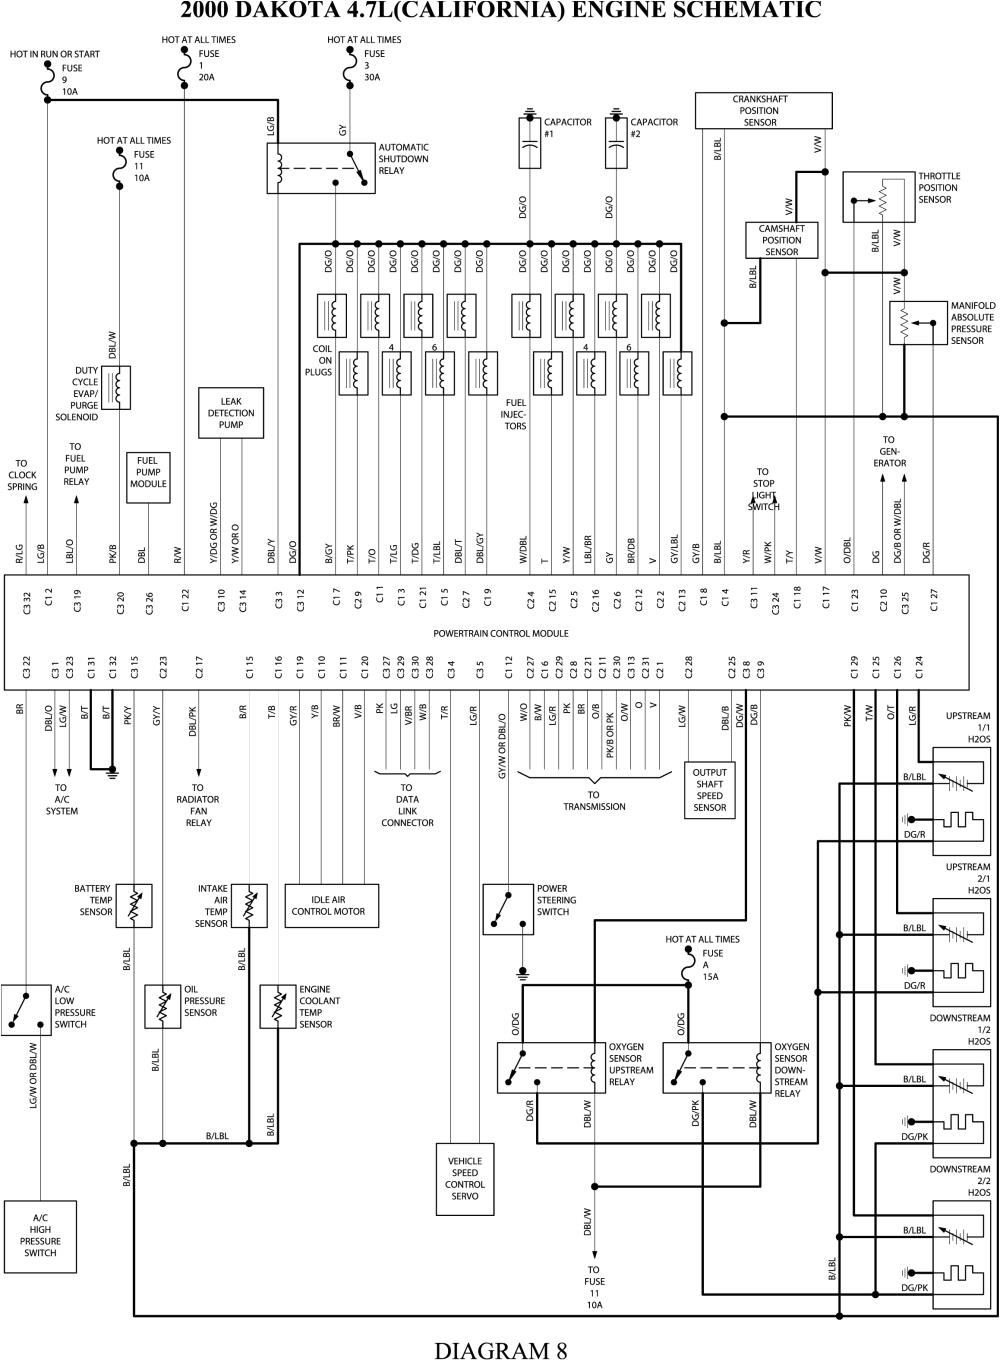 repair guides wiring diagrams wiring diagrams autozone com wiring diagram for 2000 dodge dakota wiring diagram for 2000 dodge dakota